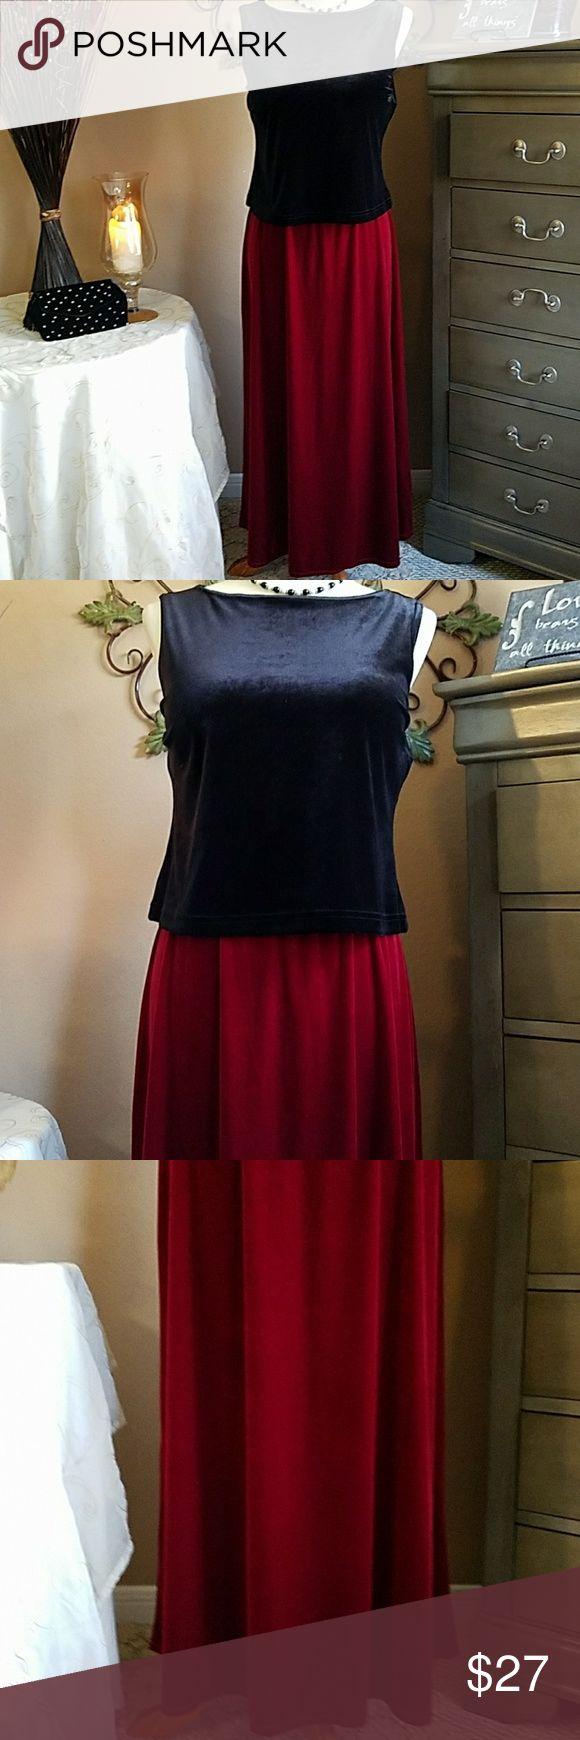 SUSAN GRAVER 💋Red Velvet Maxi Skirt 💋Rich Ruby Red Velvet Maxi💋 Pristine condition with gathered elastic slip on waist. Measures 36 Length💋Brand New Quality!! Susan Graver Skirts